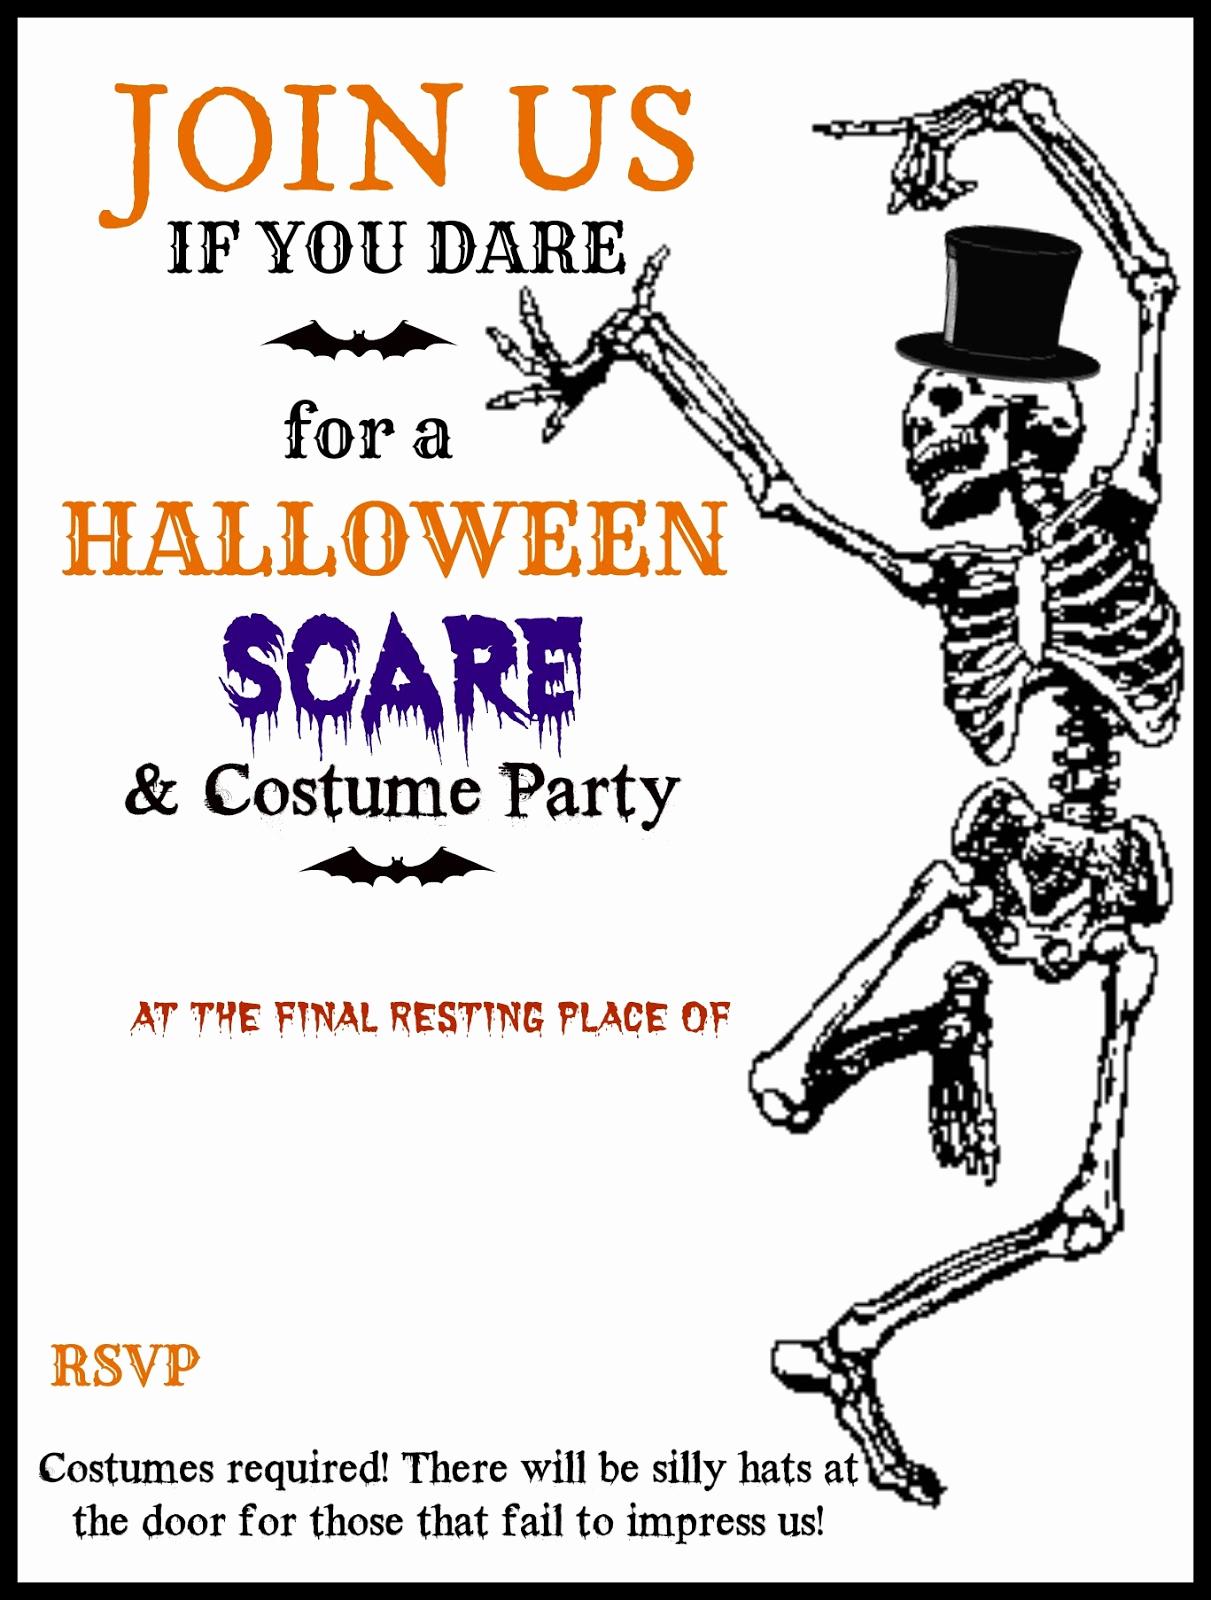 Halloween Birthday Party Invitations Lovely Crafty In Crosby Halloween Party Invitations with Template